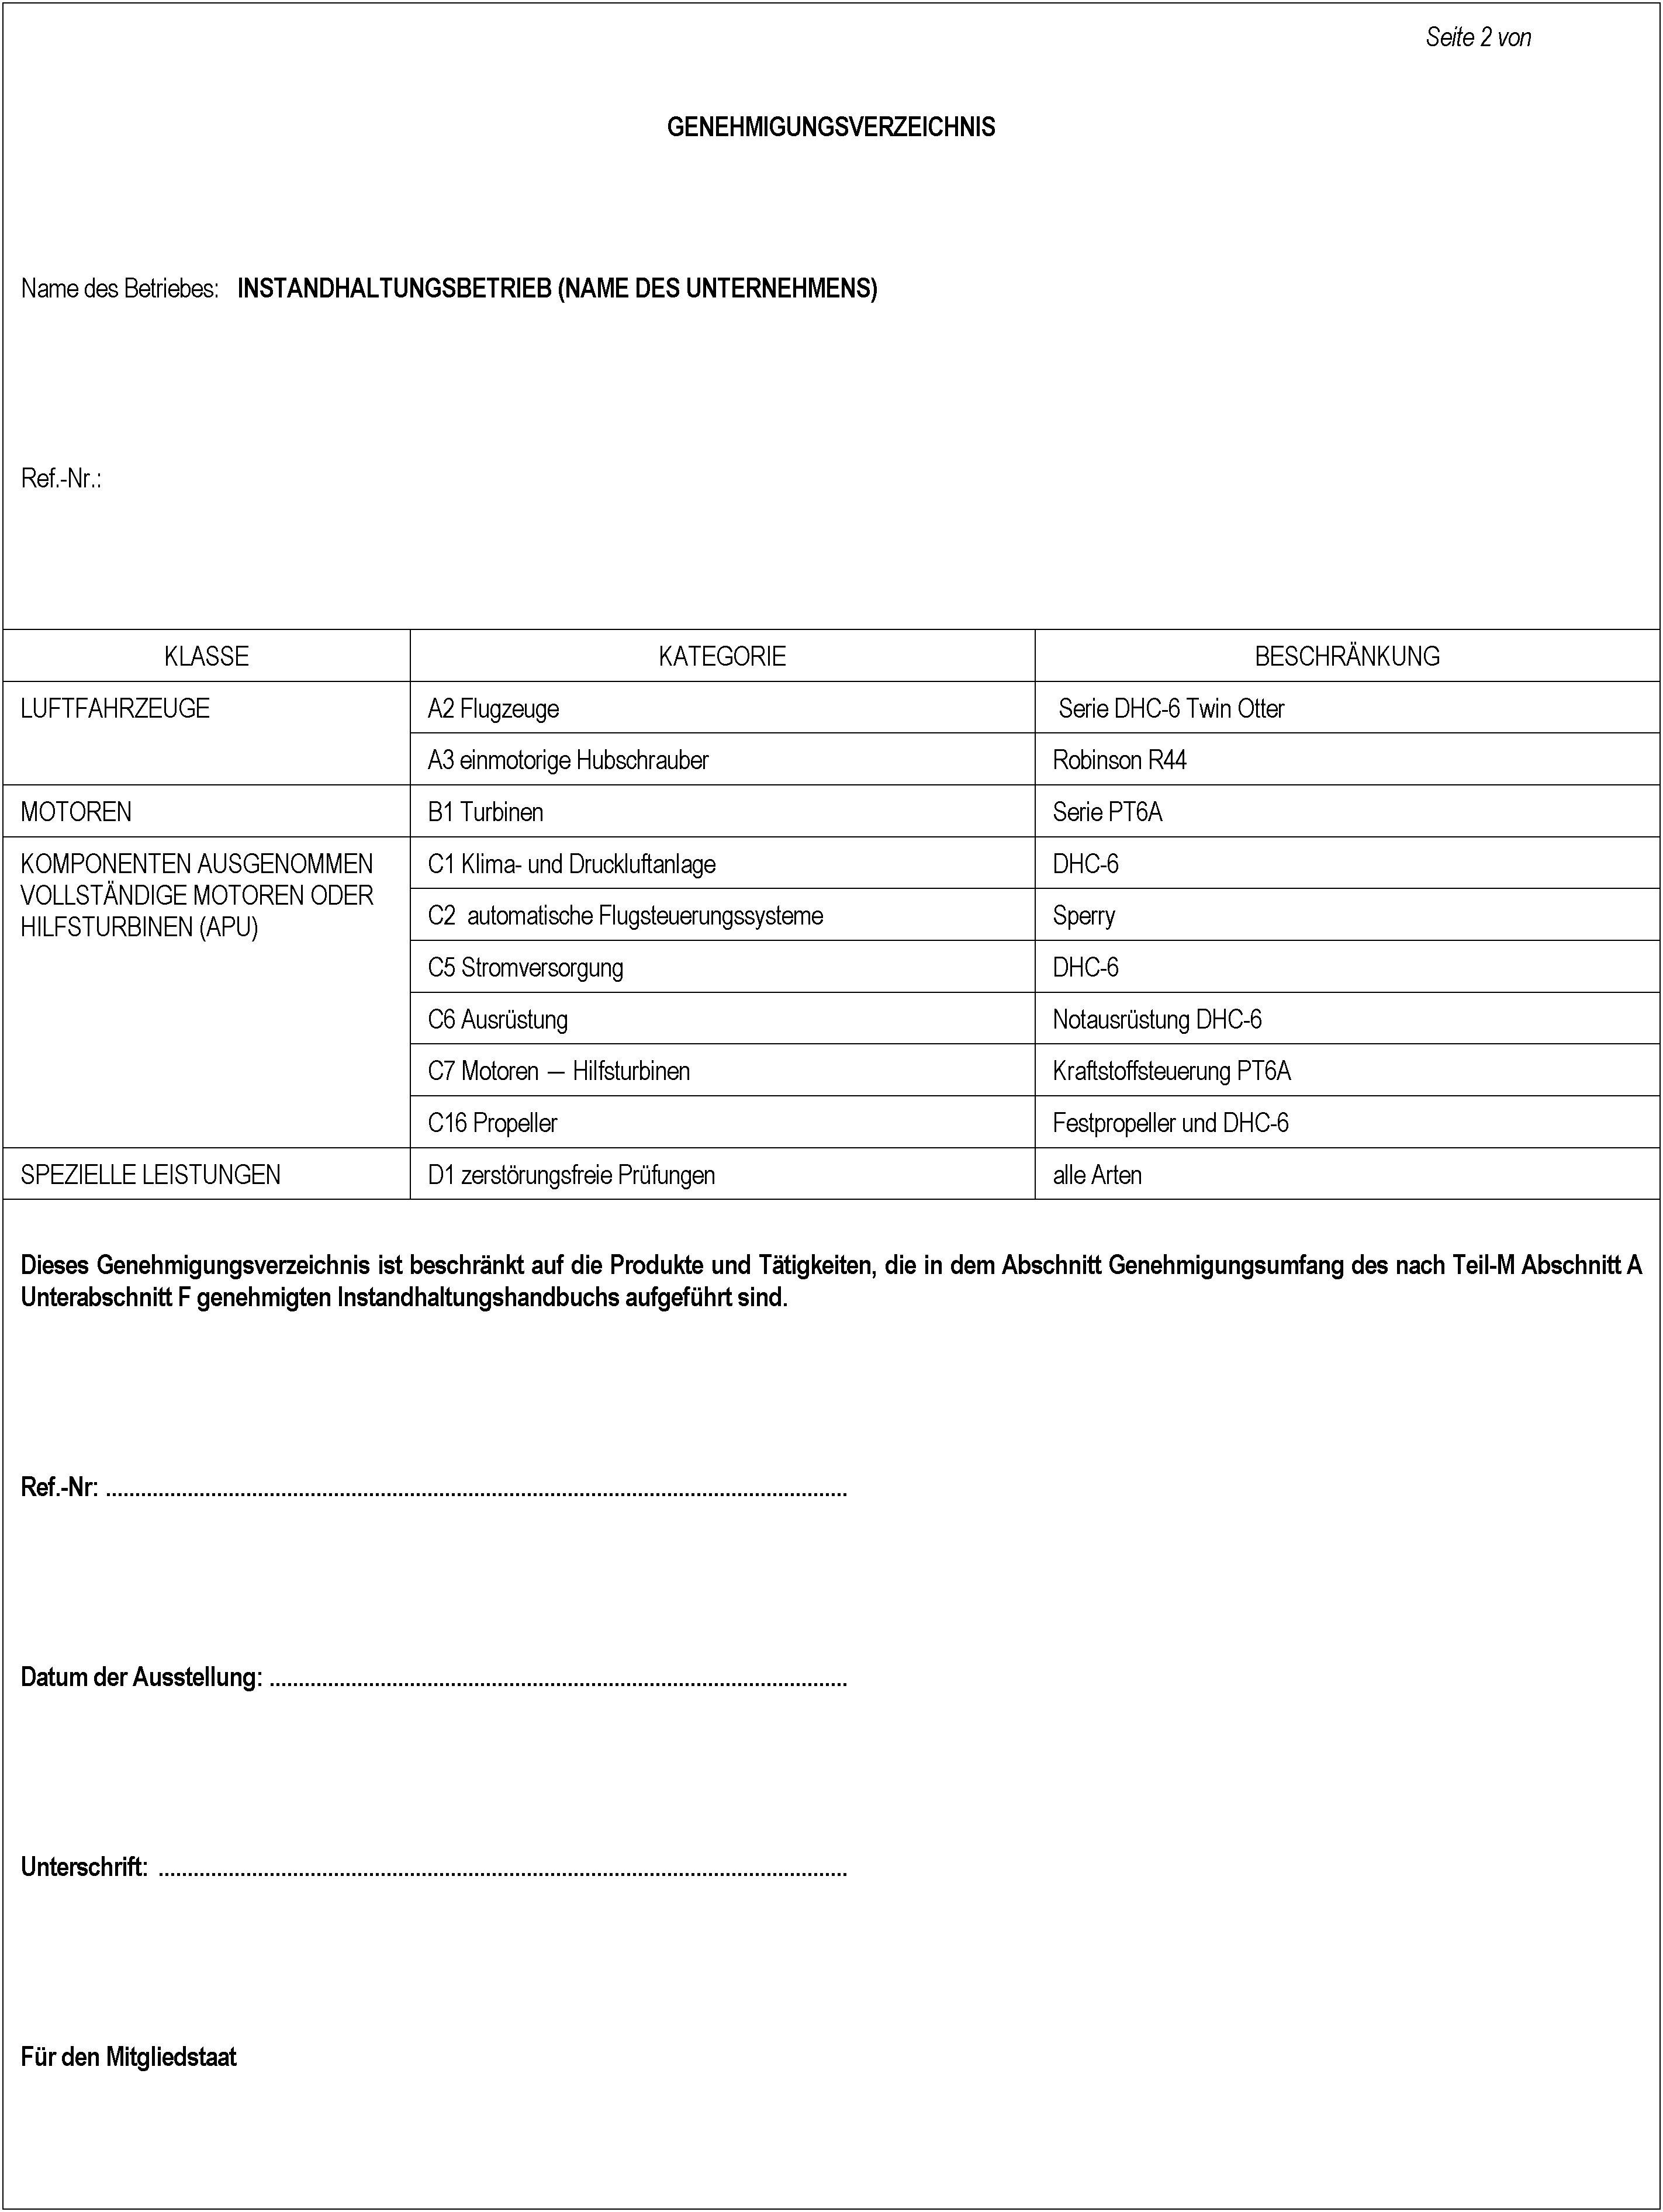 EUR-Lex - 02003R2042-20081029 - EN - EUR-Lex